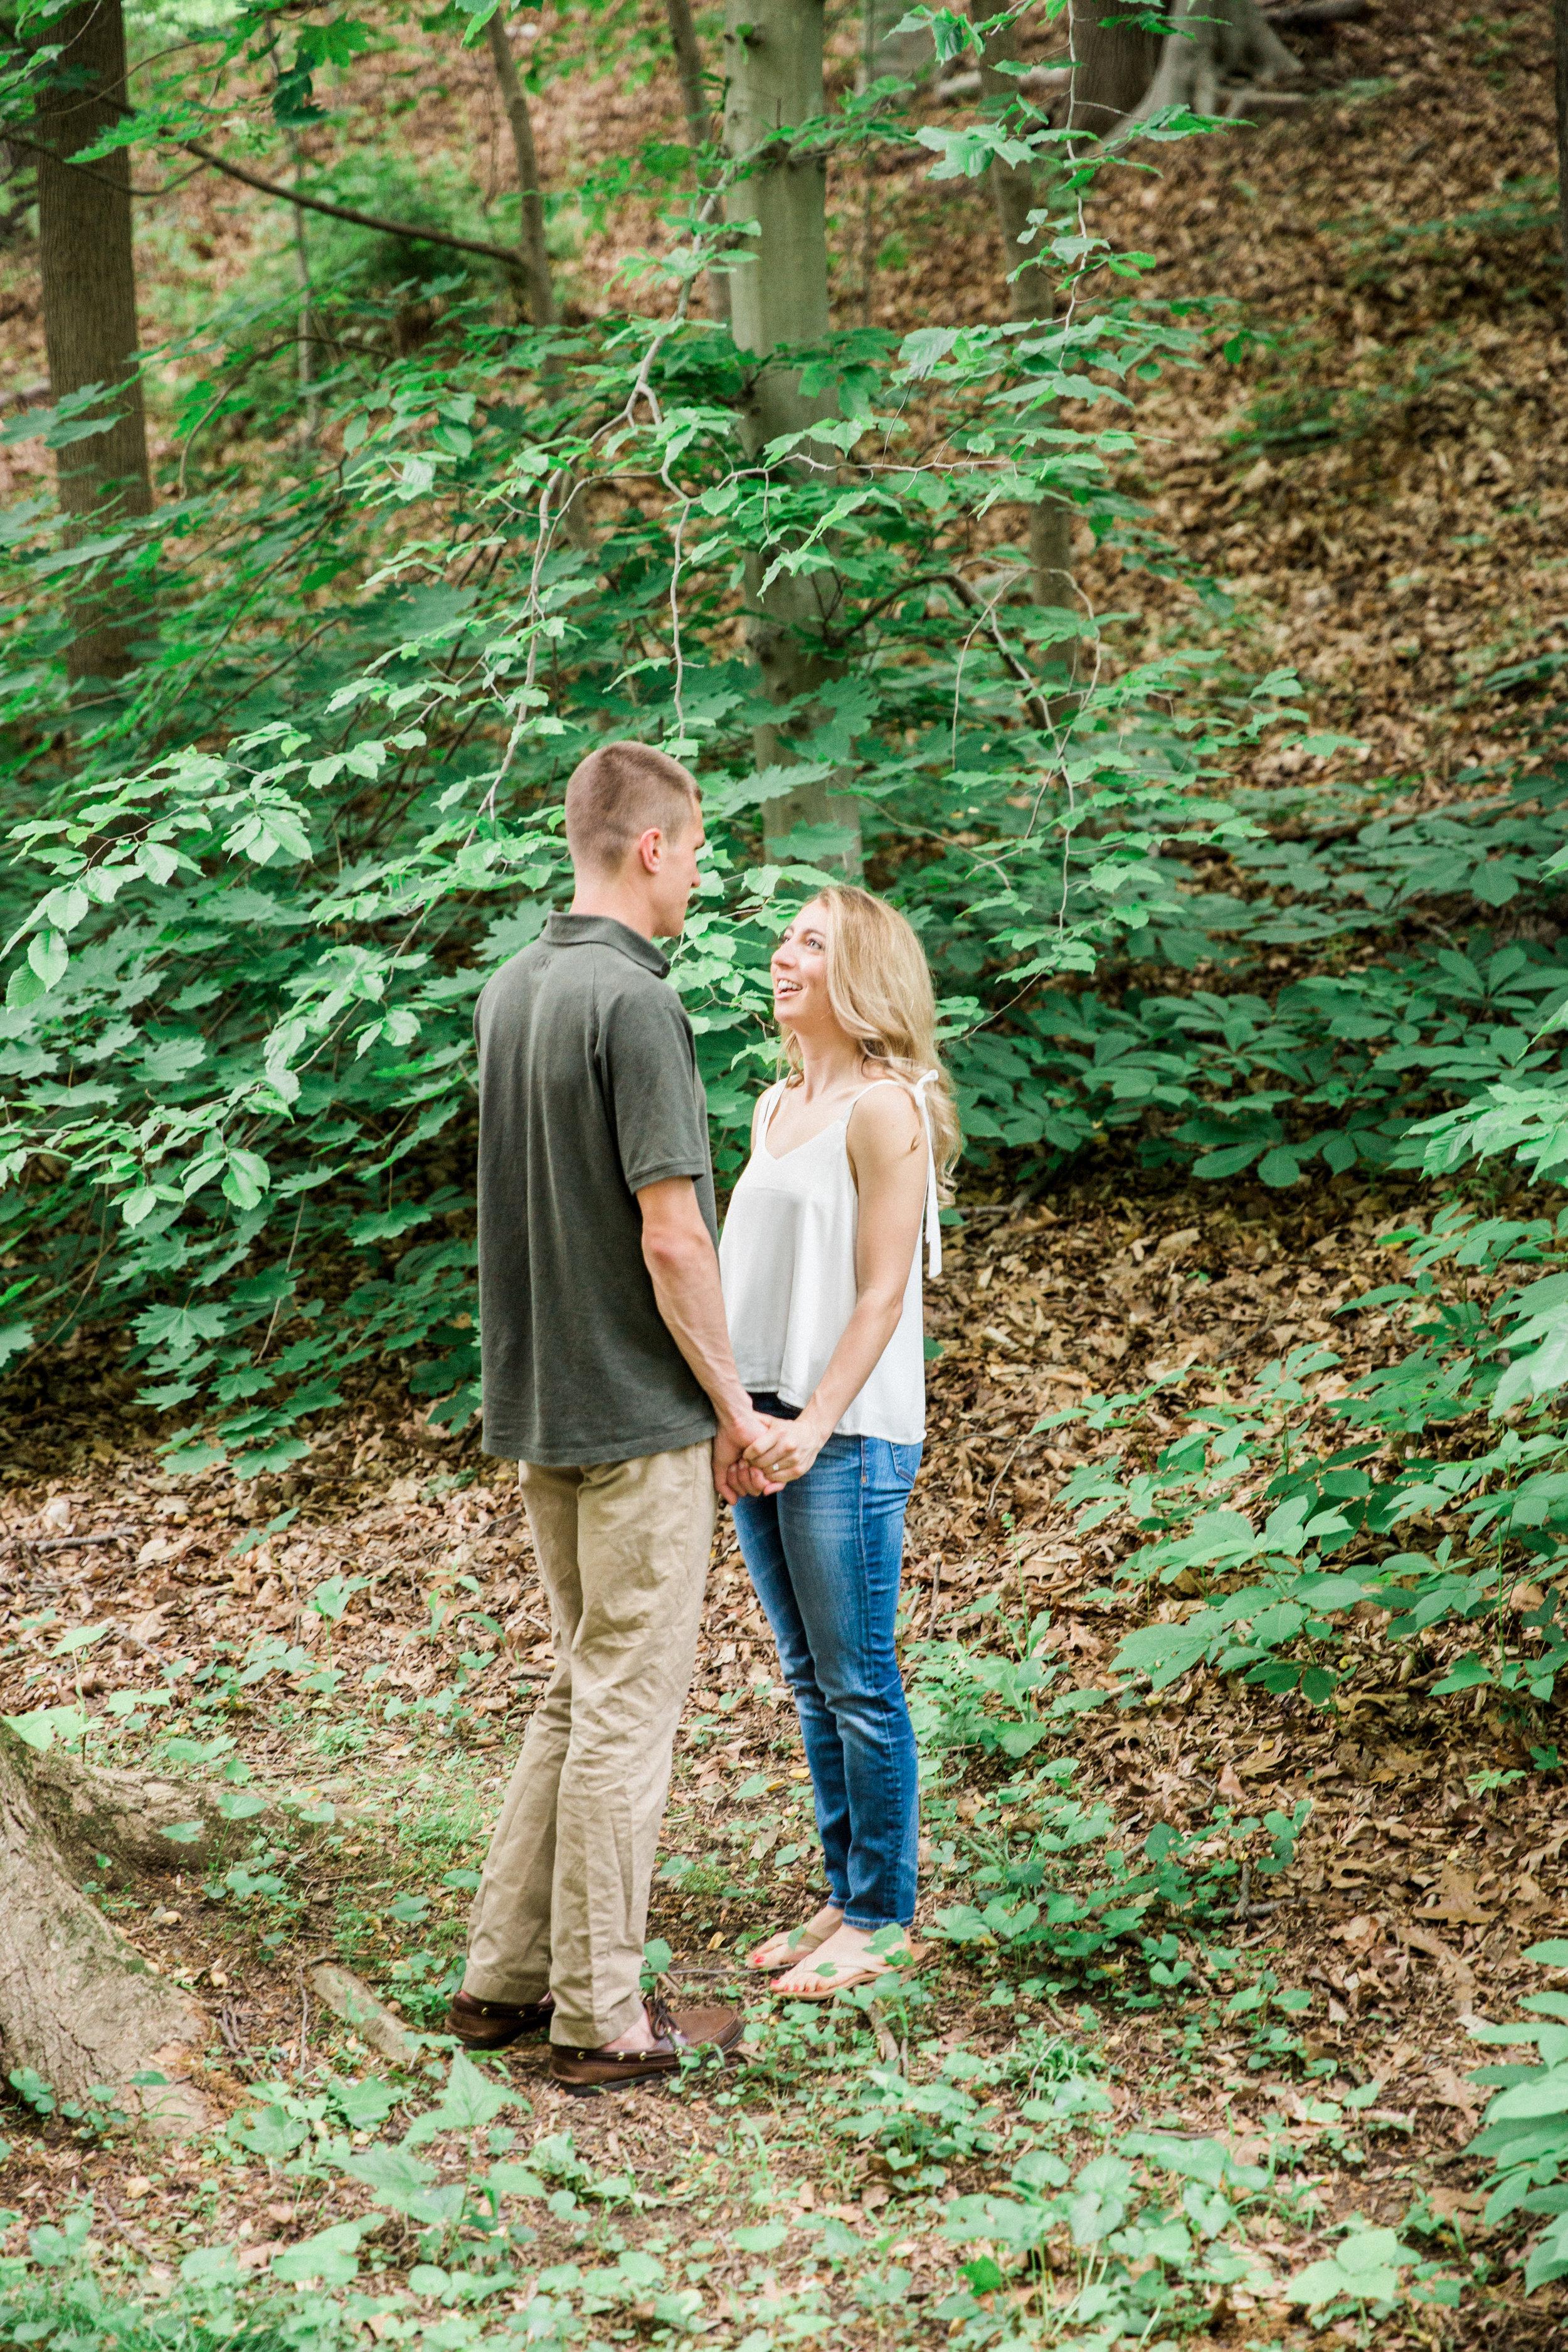 004-Wilmington-Delaware-Summer-Garden-Engagement-Emily-Andrew.jpg